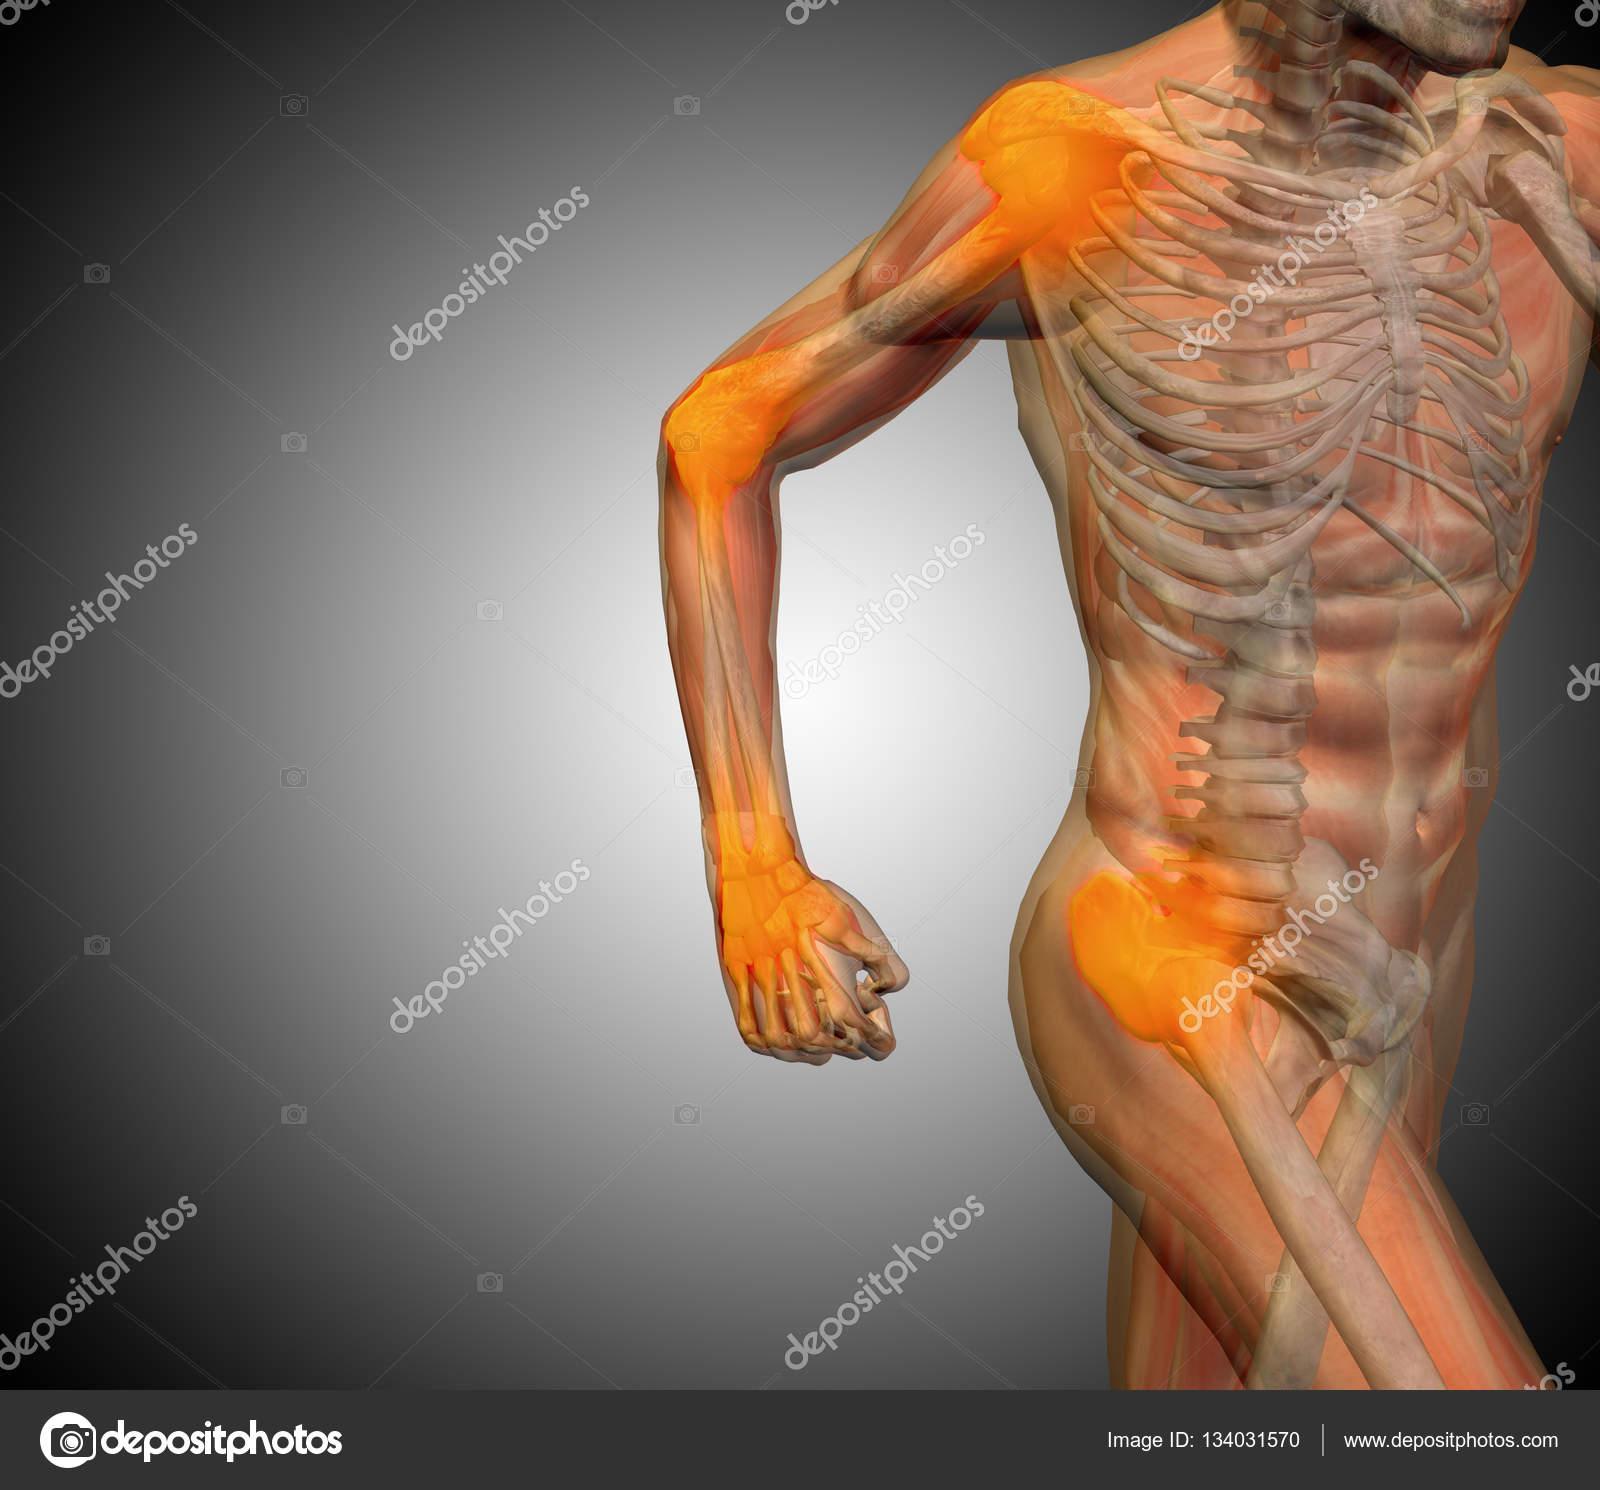 anatomía humana sobre fondo gris — Foto de stock © design36 #134031570